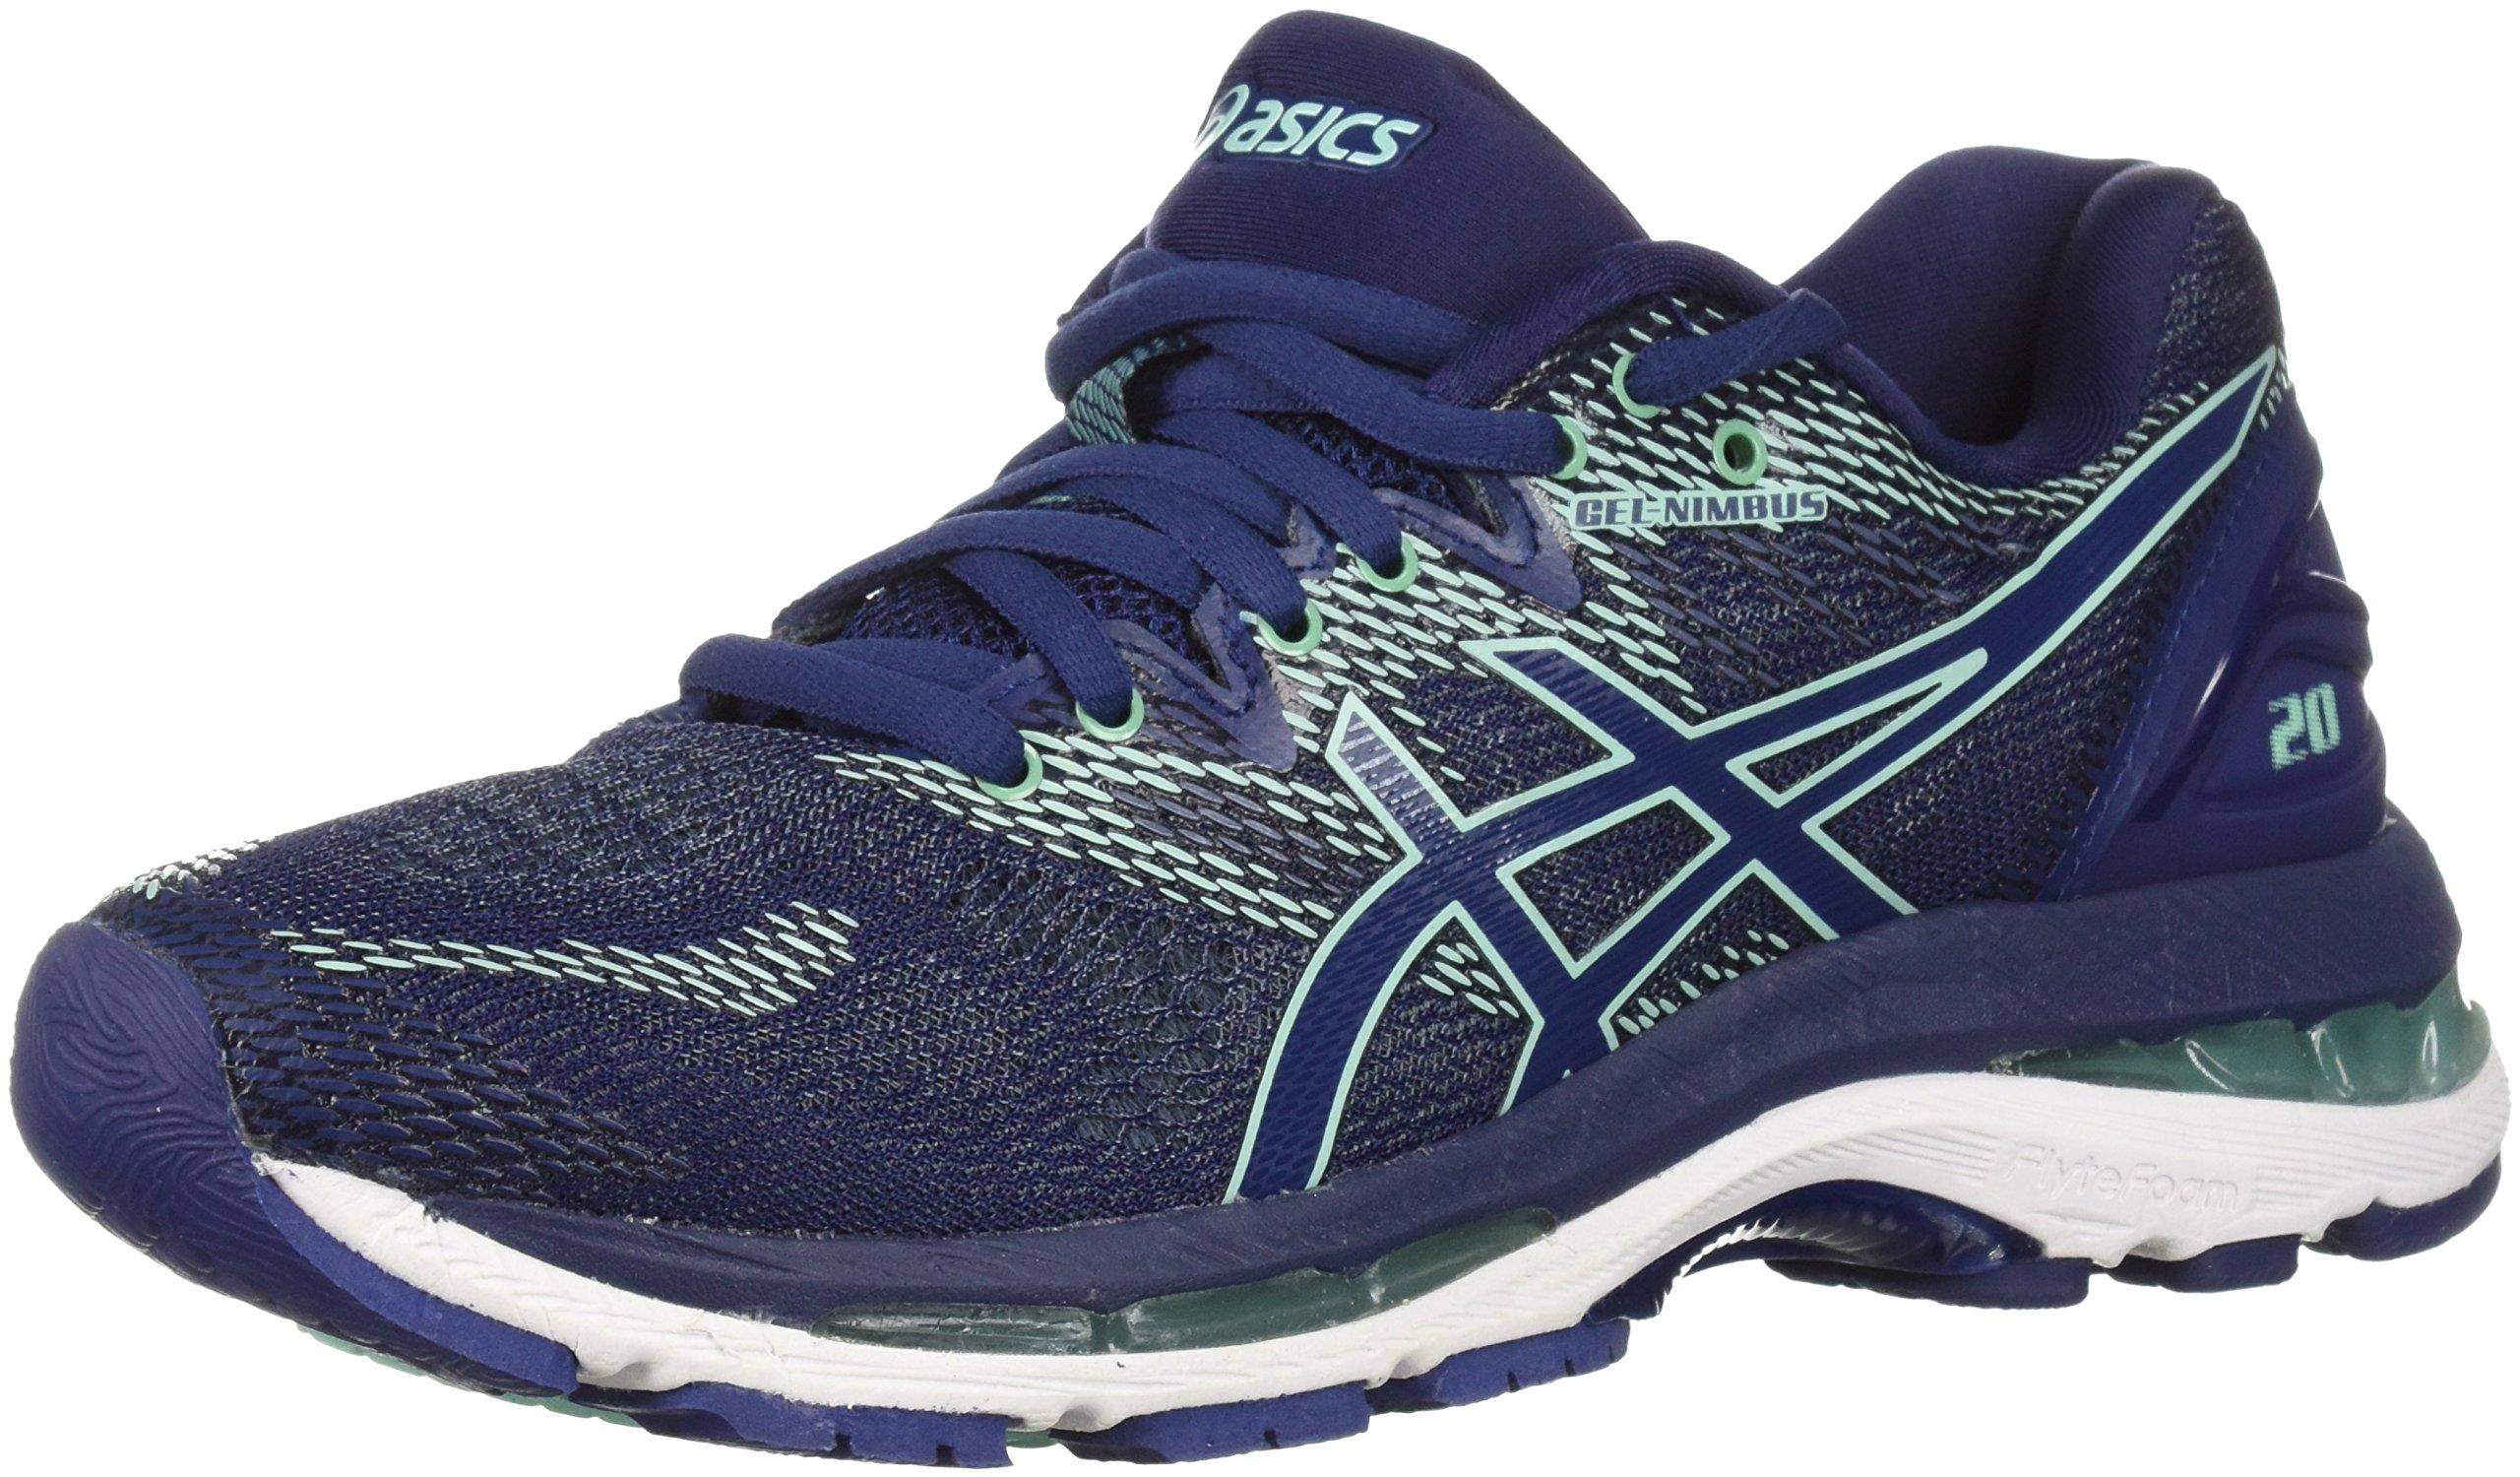 ASICS Women's Gel-Nimbus 20 Running Shoe, indigo blue/indigo blue/opal green, 5 D US by ASICS